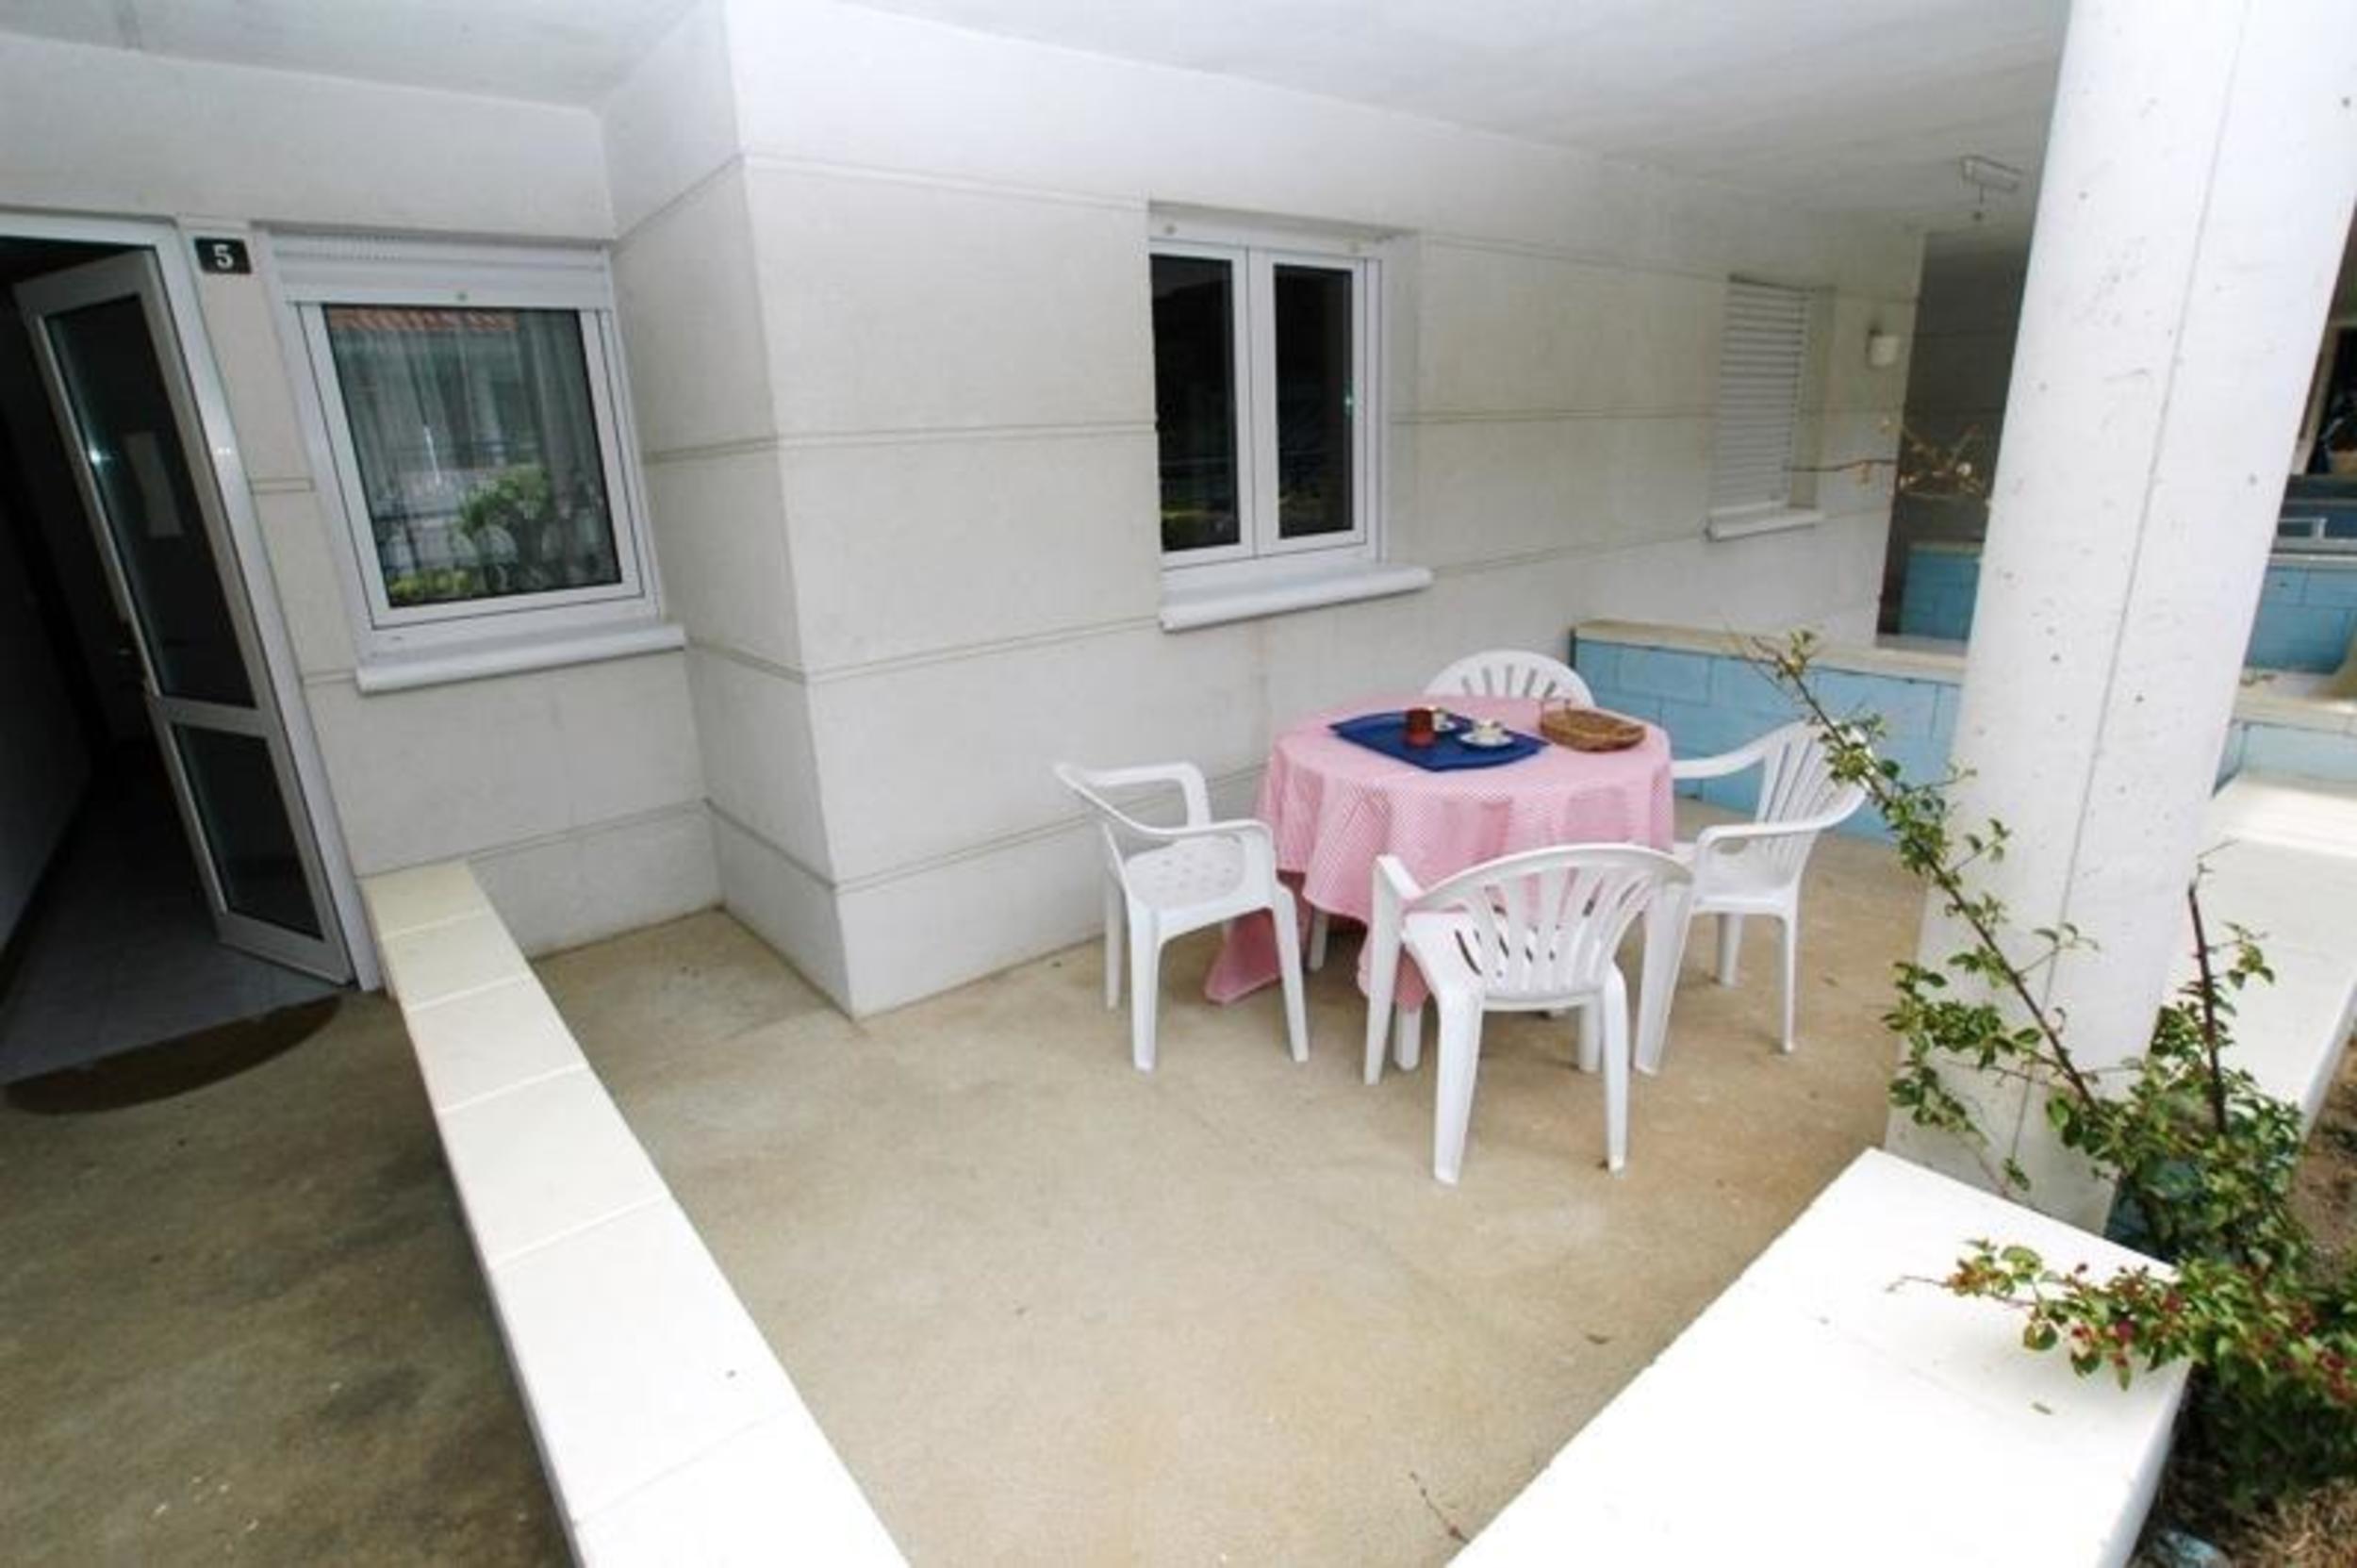 Ferienwohnung Apartment - 2 Bedrooms with Pool and Sea views - 102761 (2360861), Isla, Costa de Cantabria, Kantabrien, Spanien, Bild 2